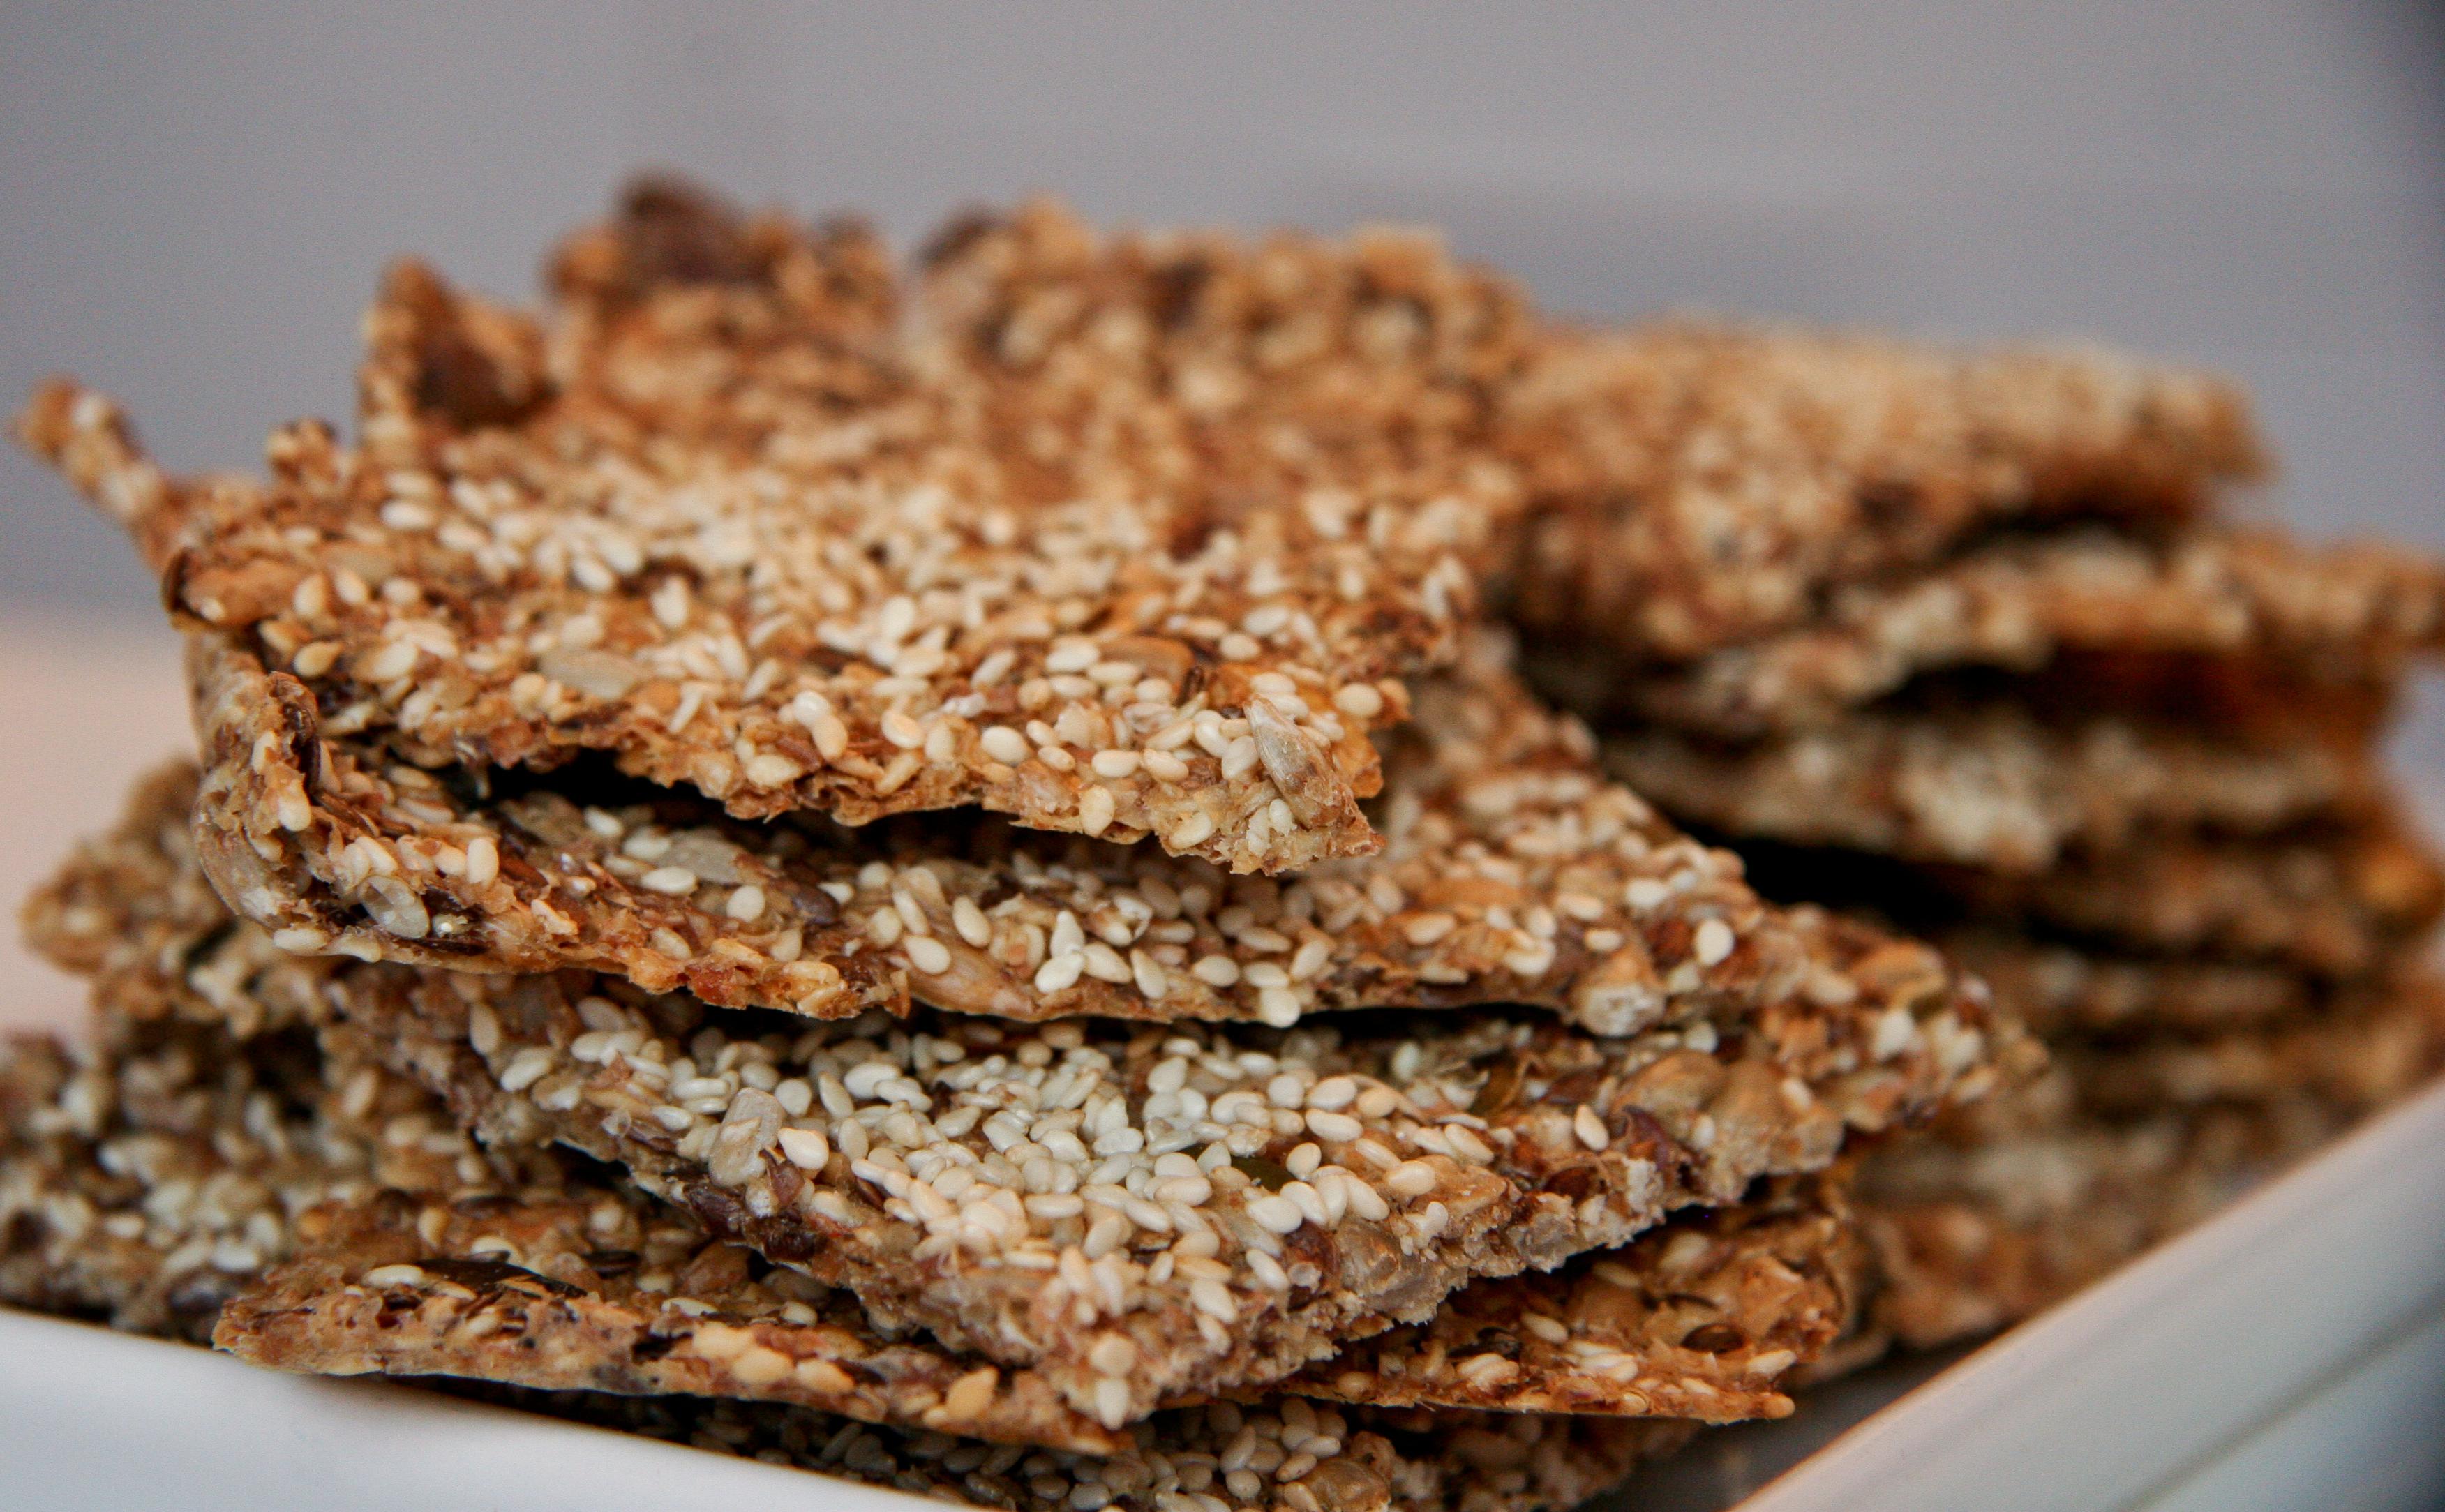 A healthy, cheap breakfast – the River's guide to crispbread